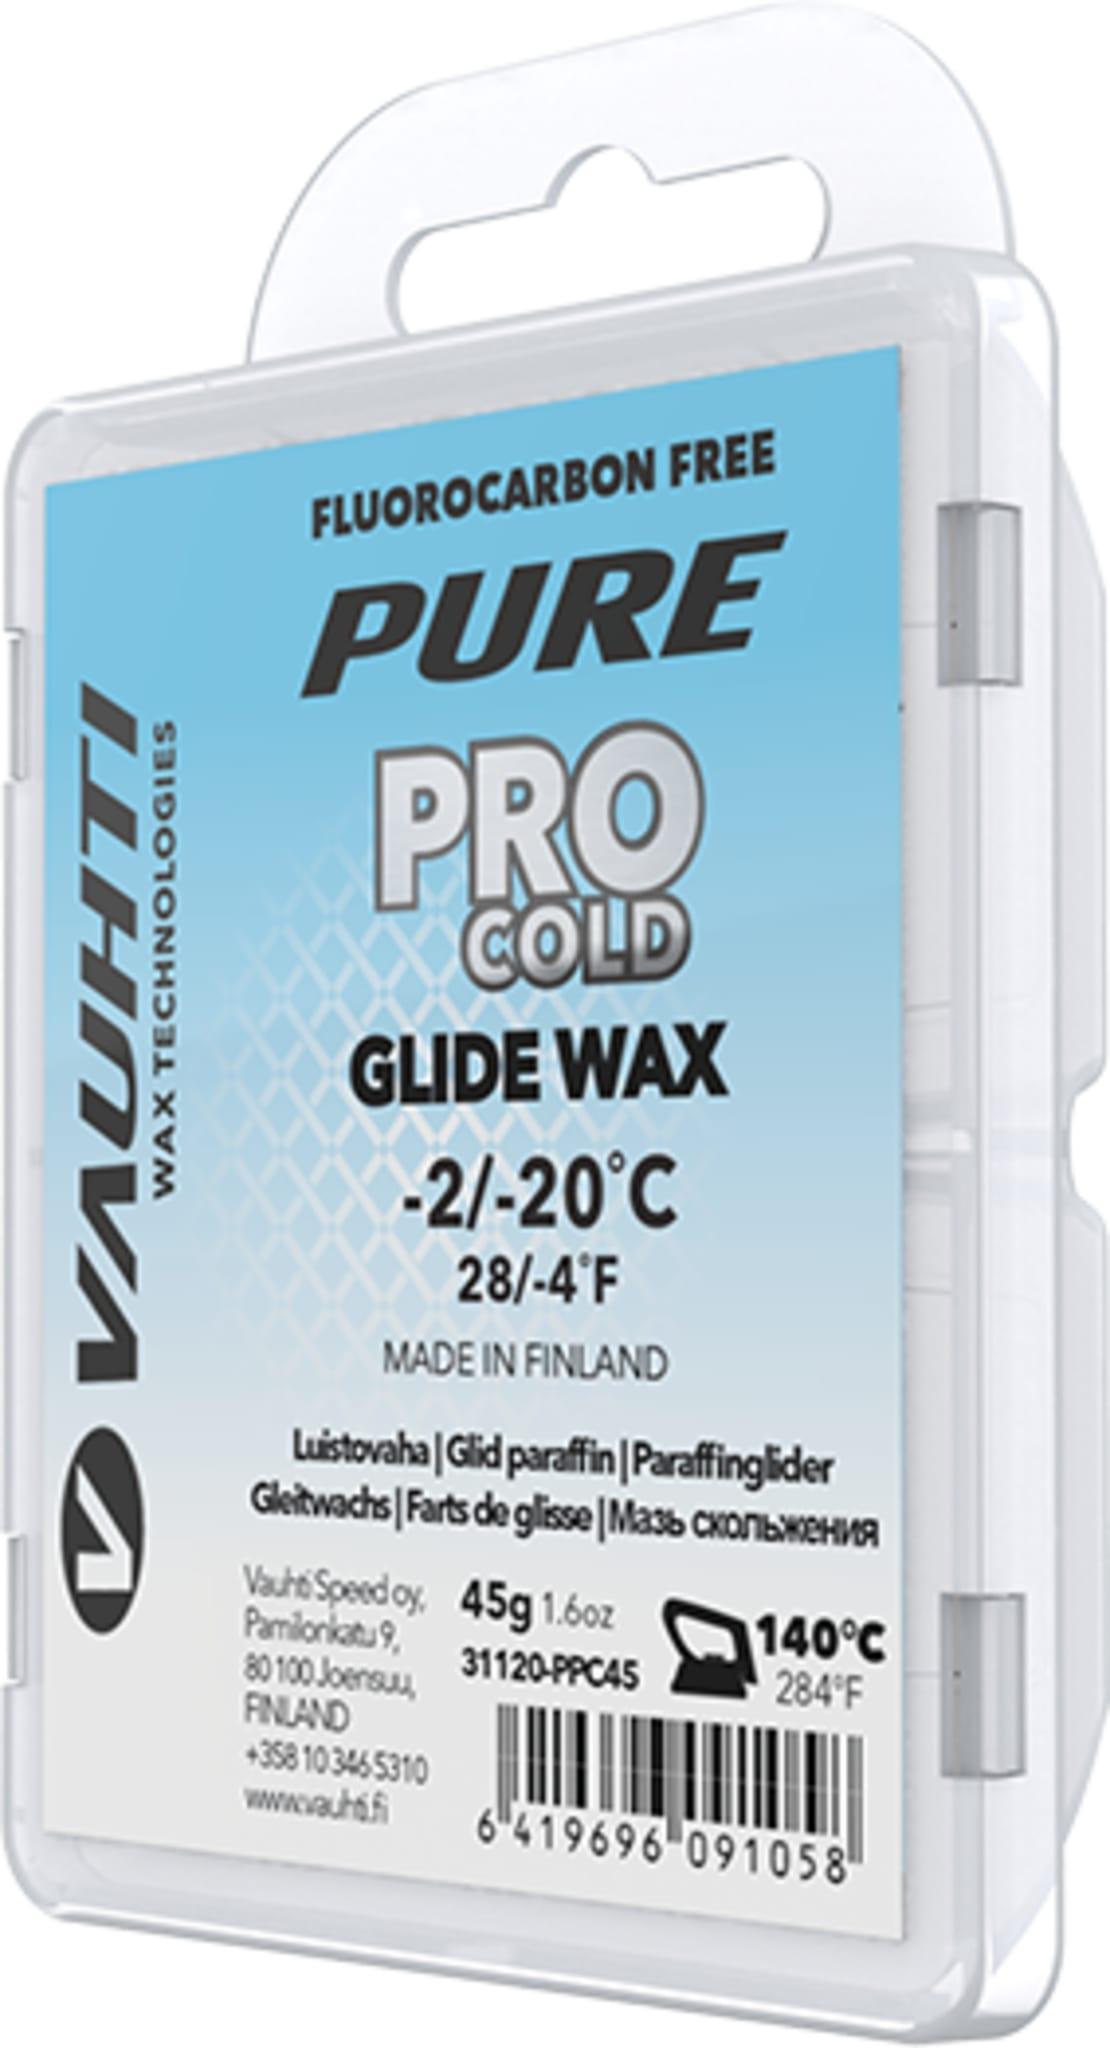 Fluorfri hardglider fra Vauhti i temperaturene -2/-20